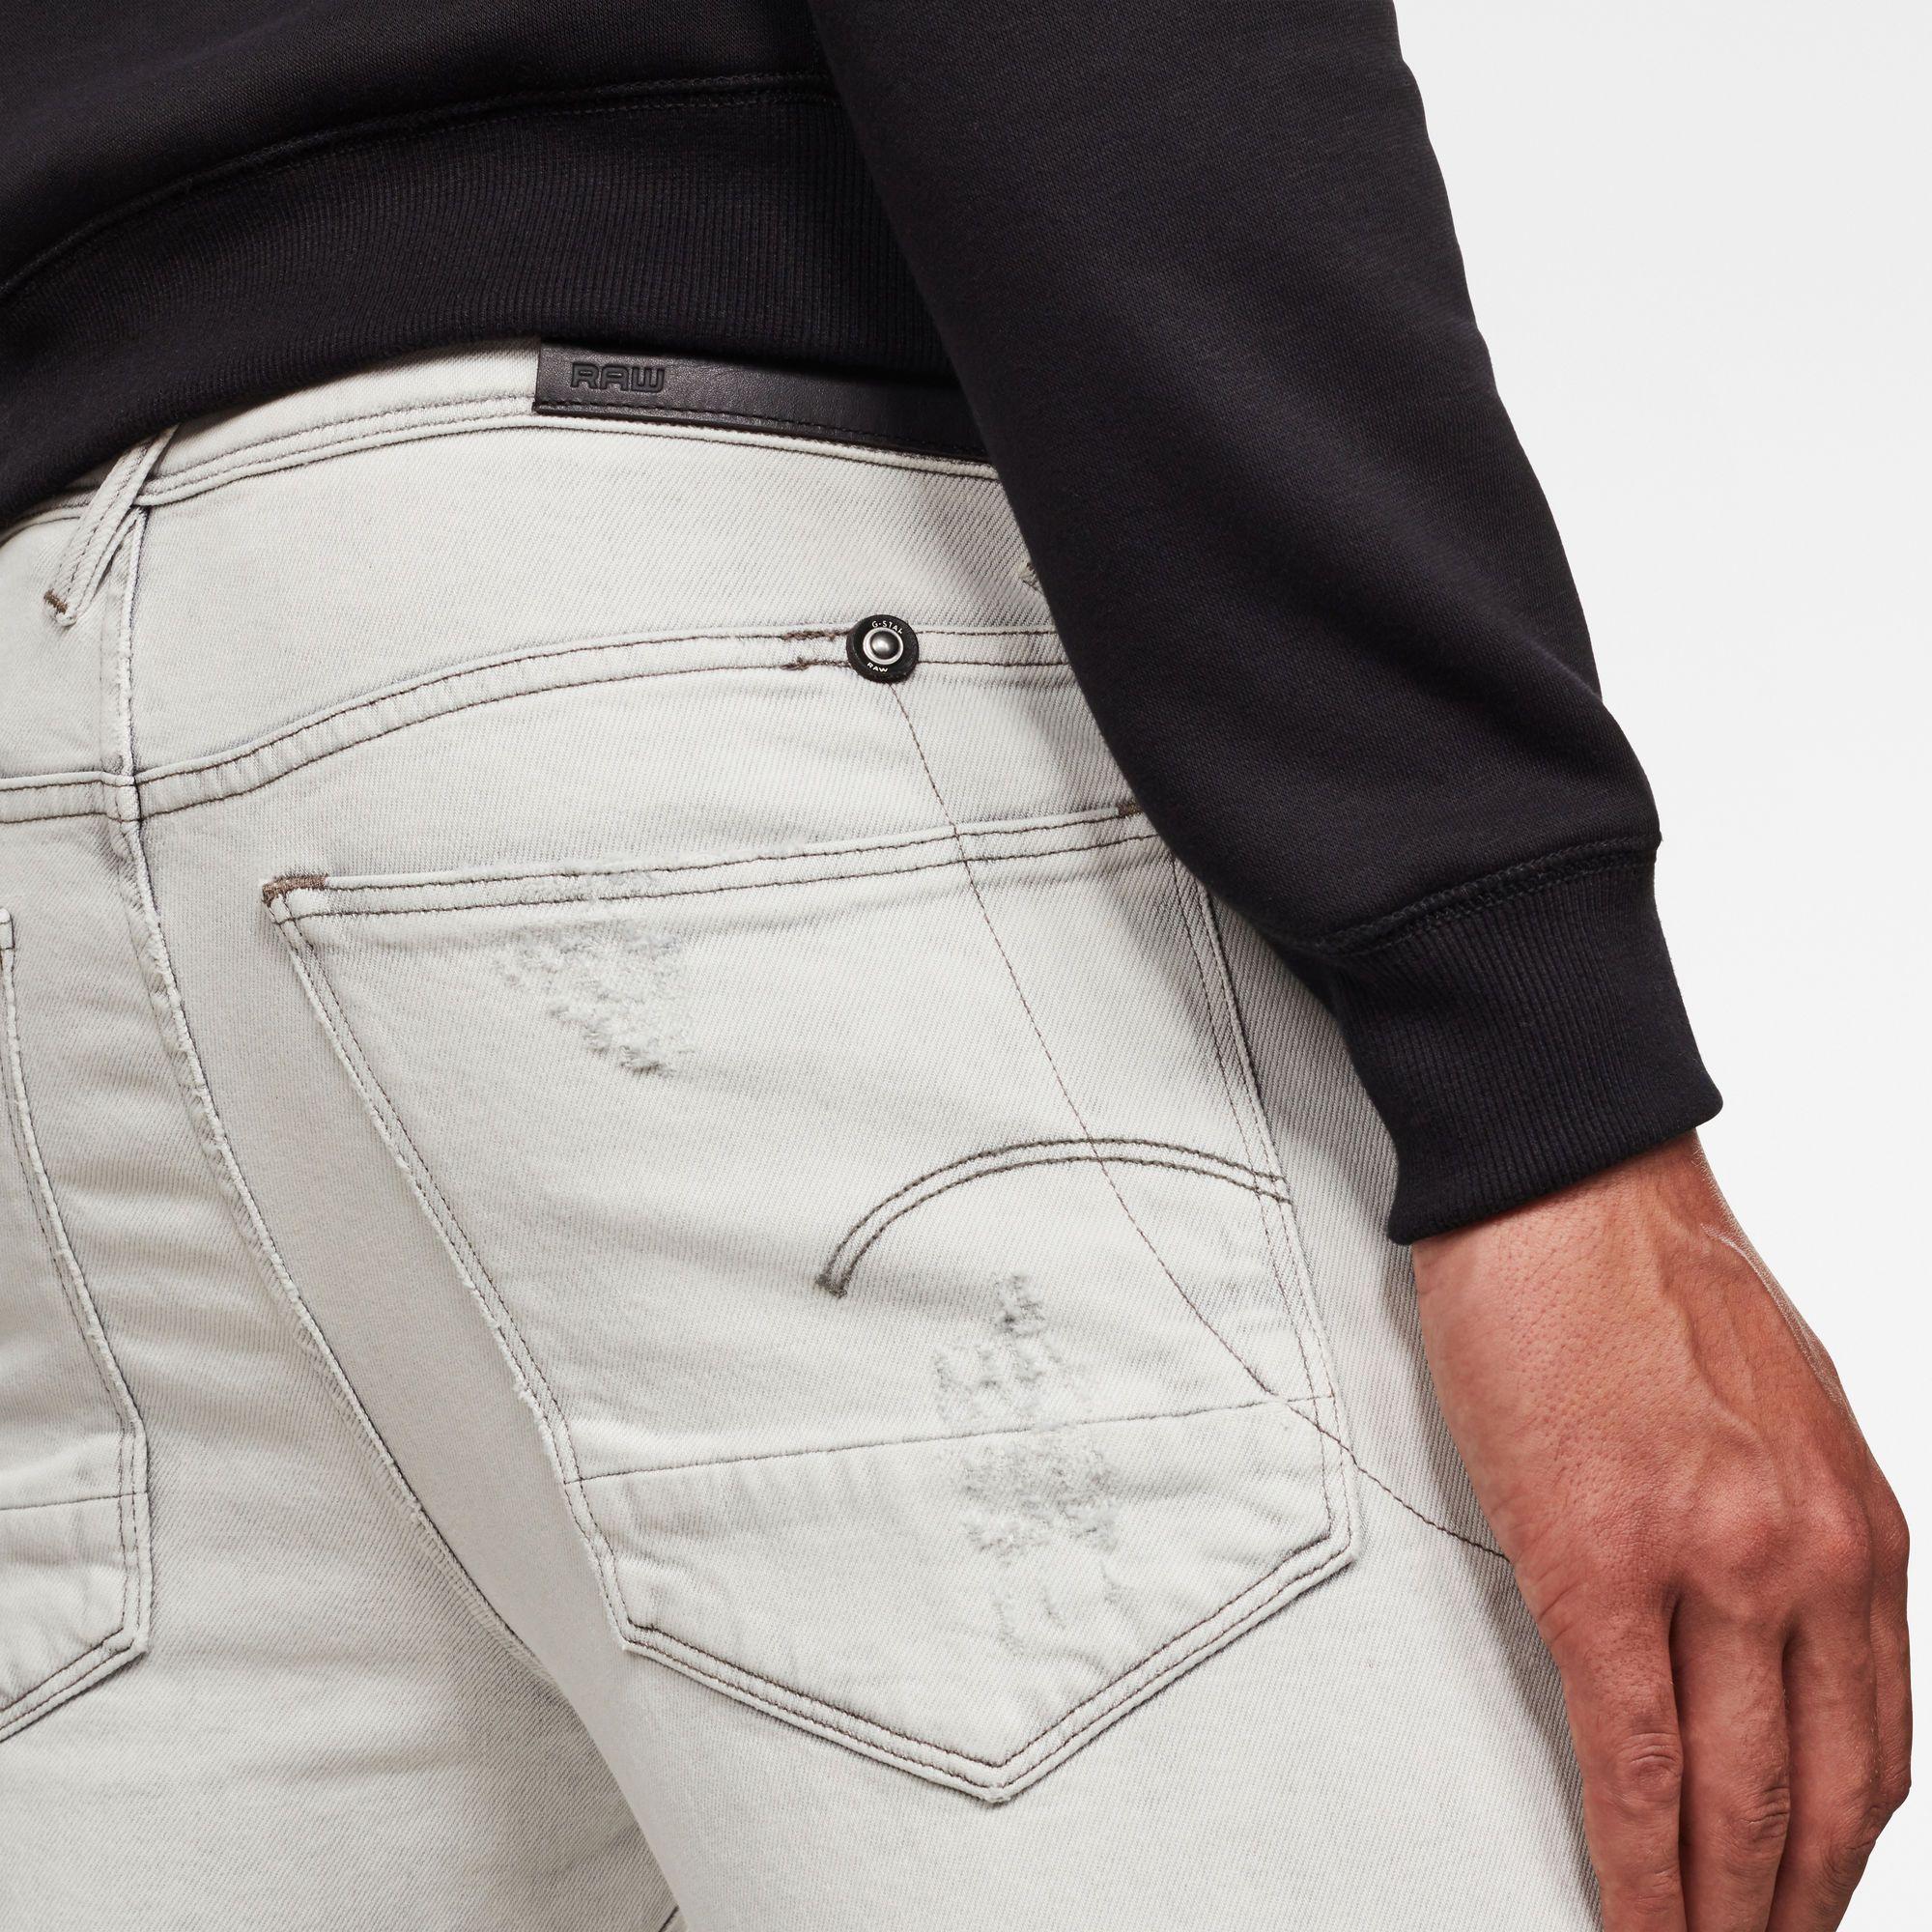 G-Star RAW G-Bleid Slim Jeans